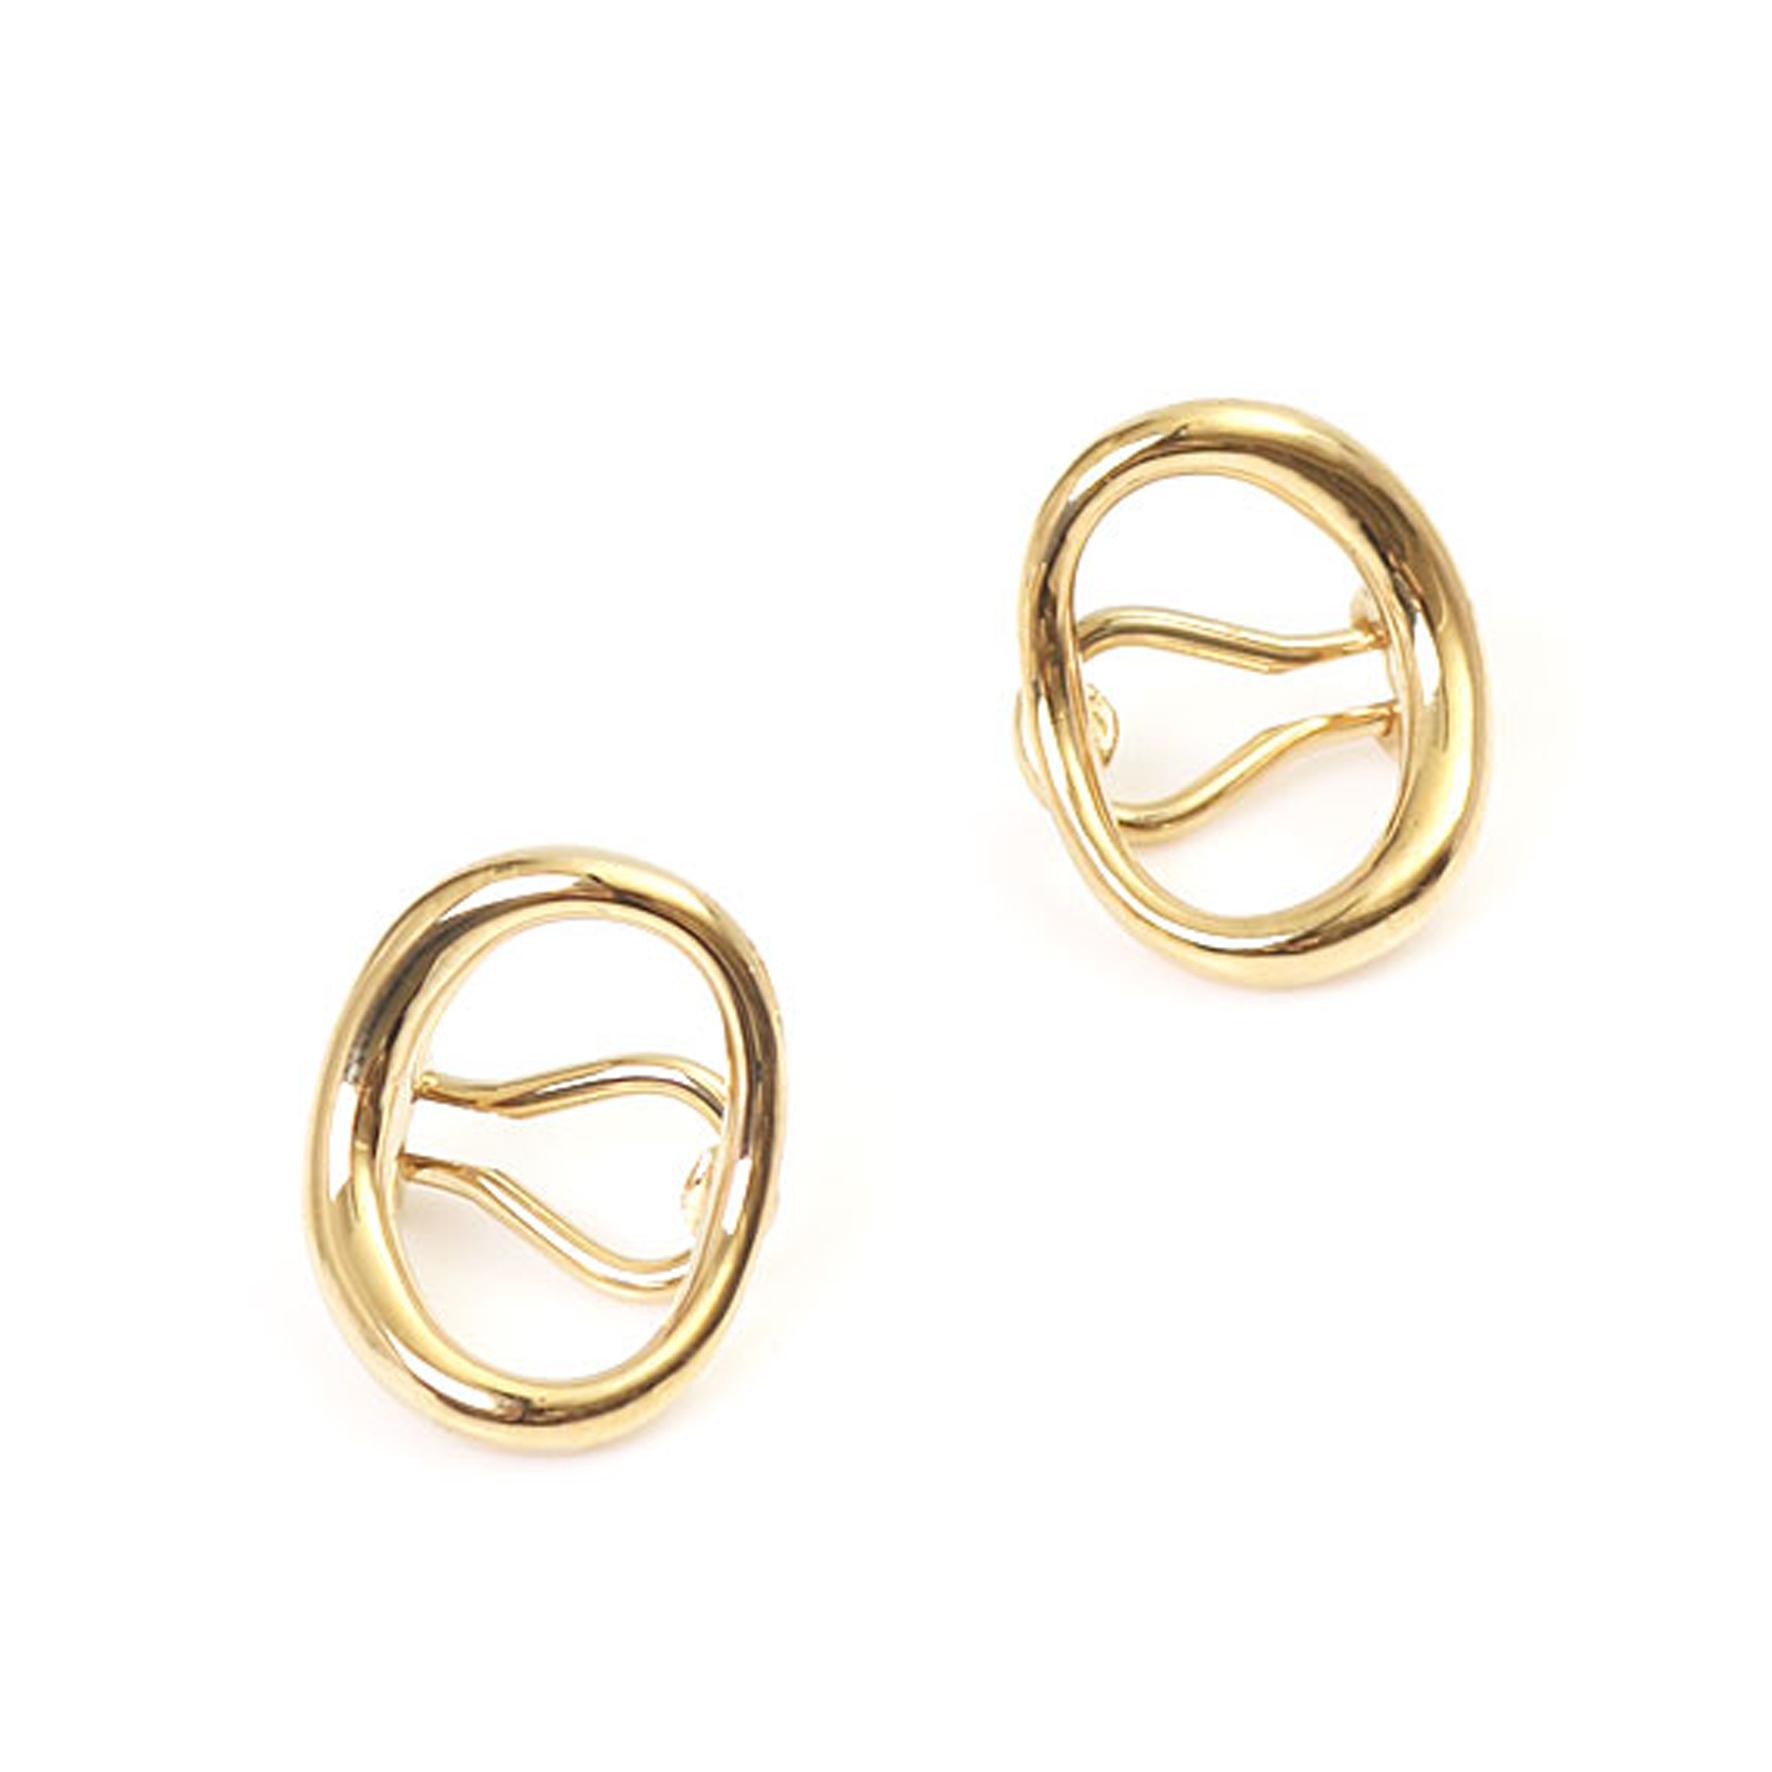 Charlotte Chesnais     Naho earrings   Yellow